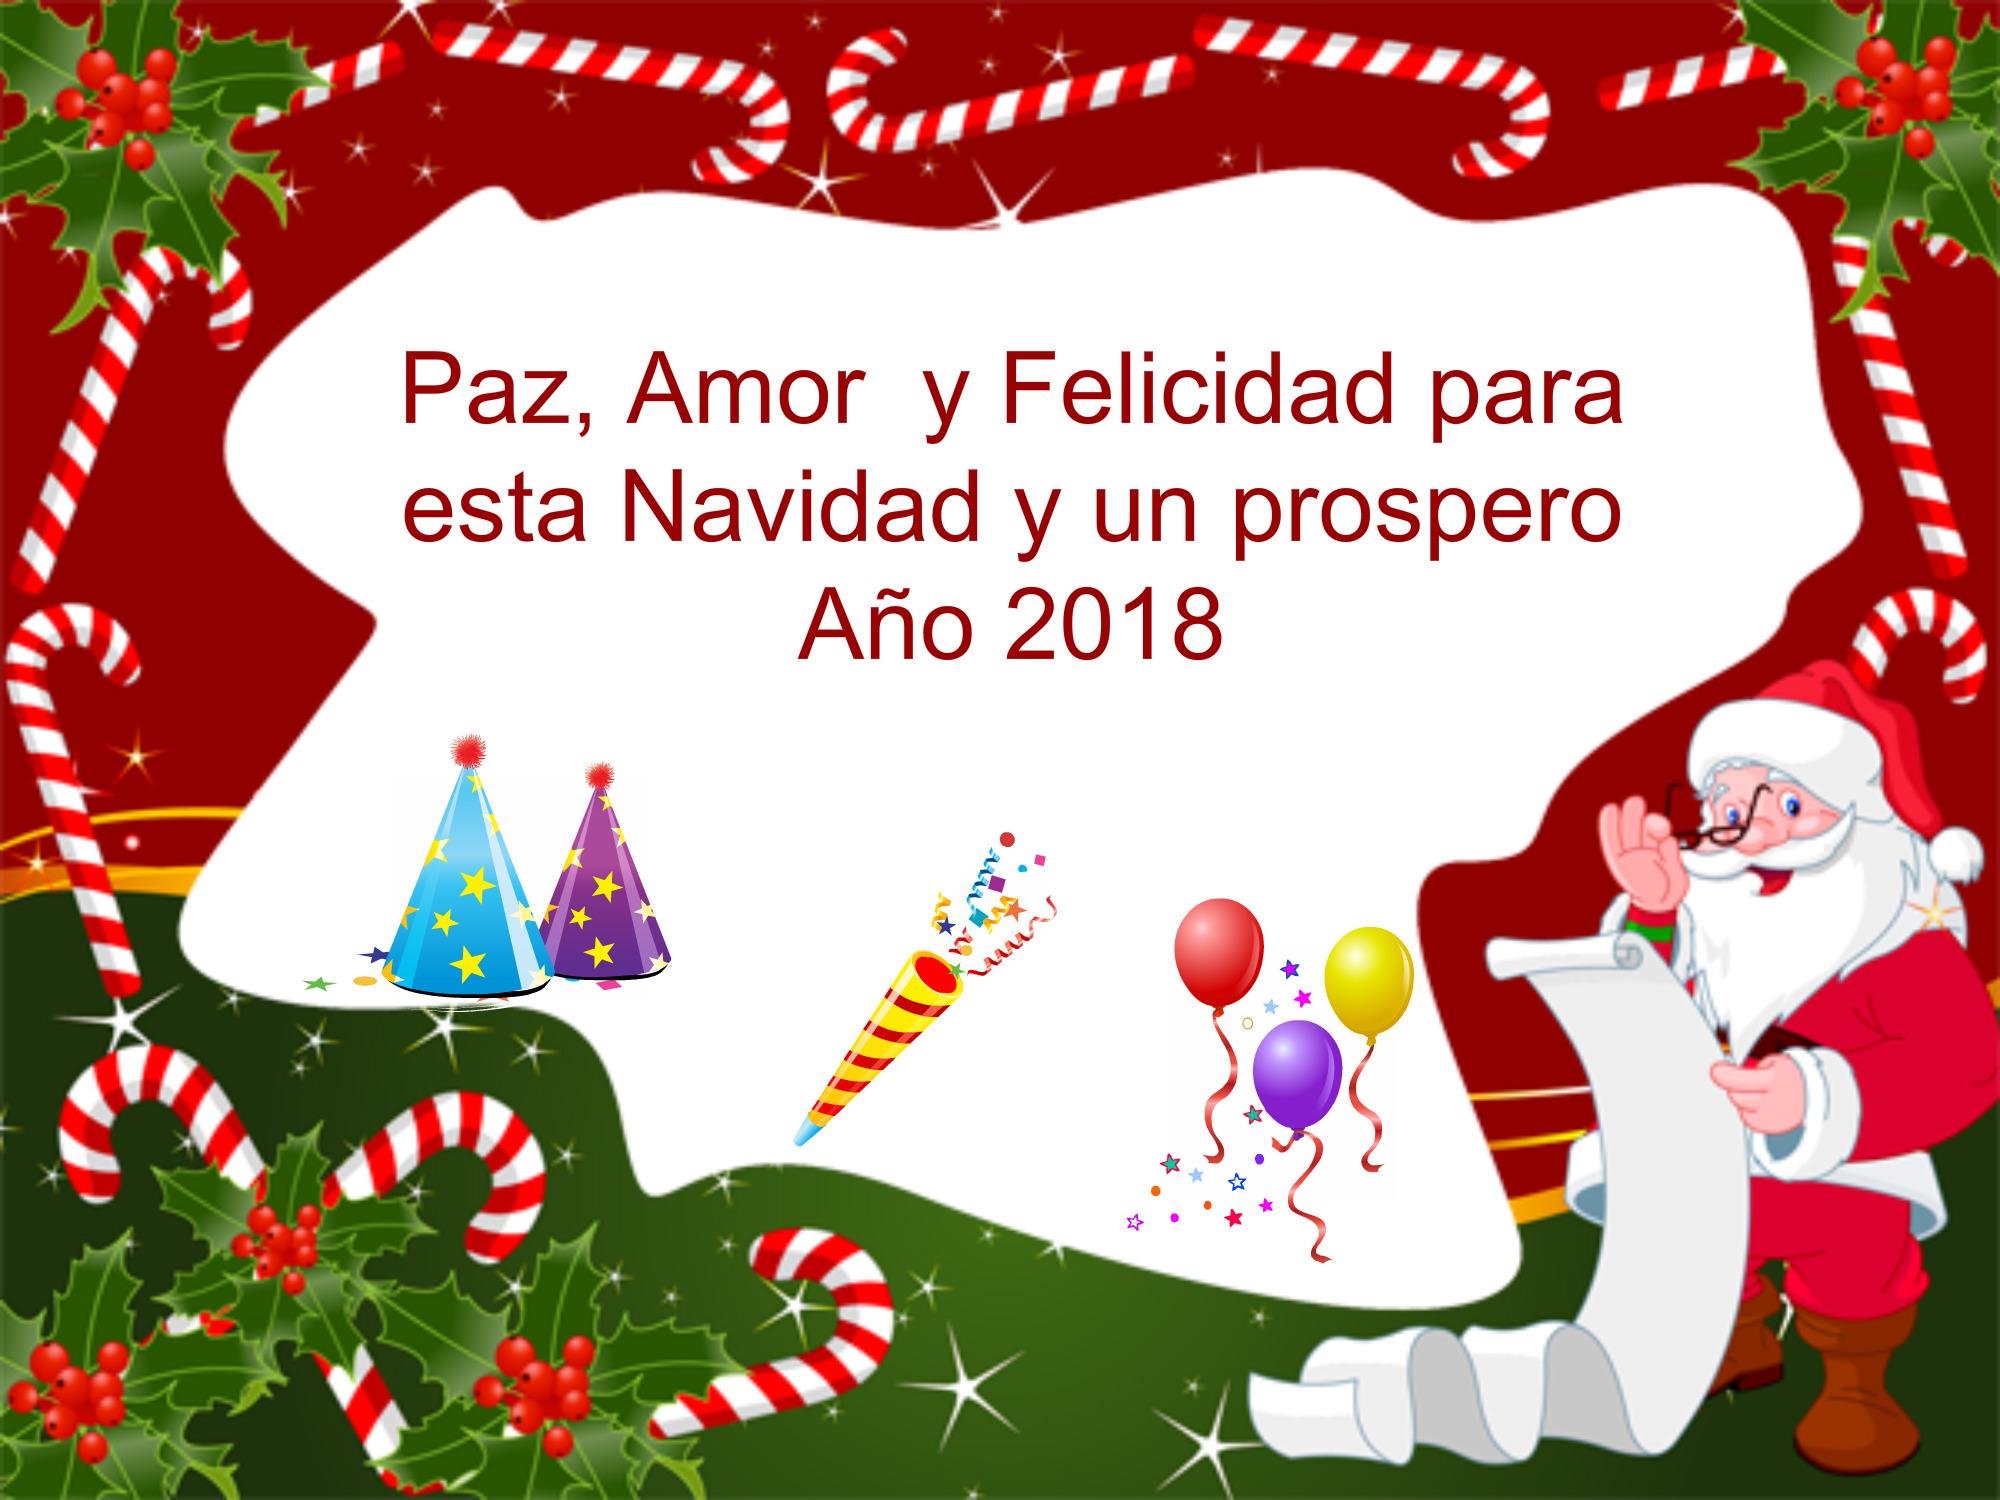 pizap.com15121229368982